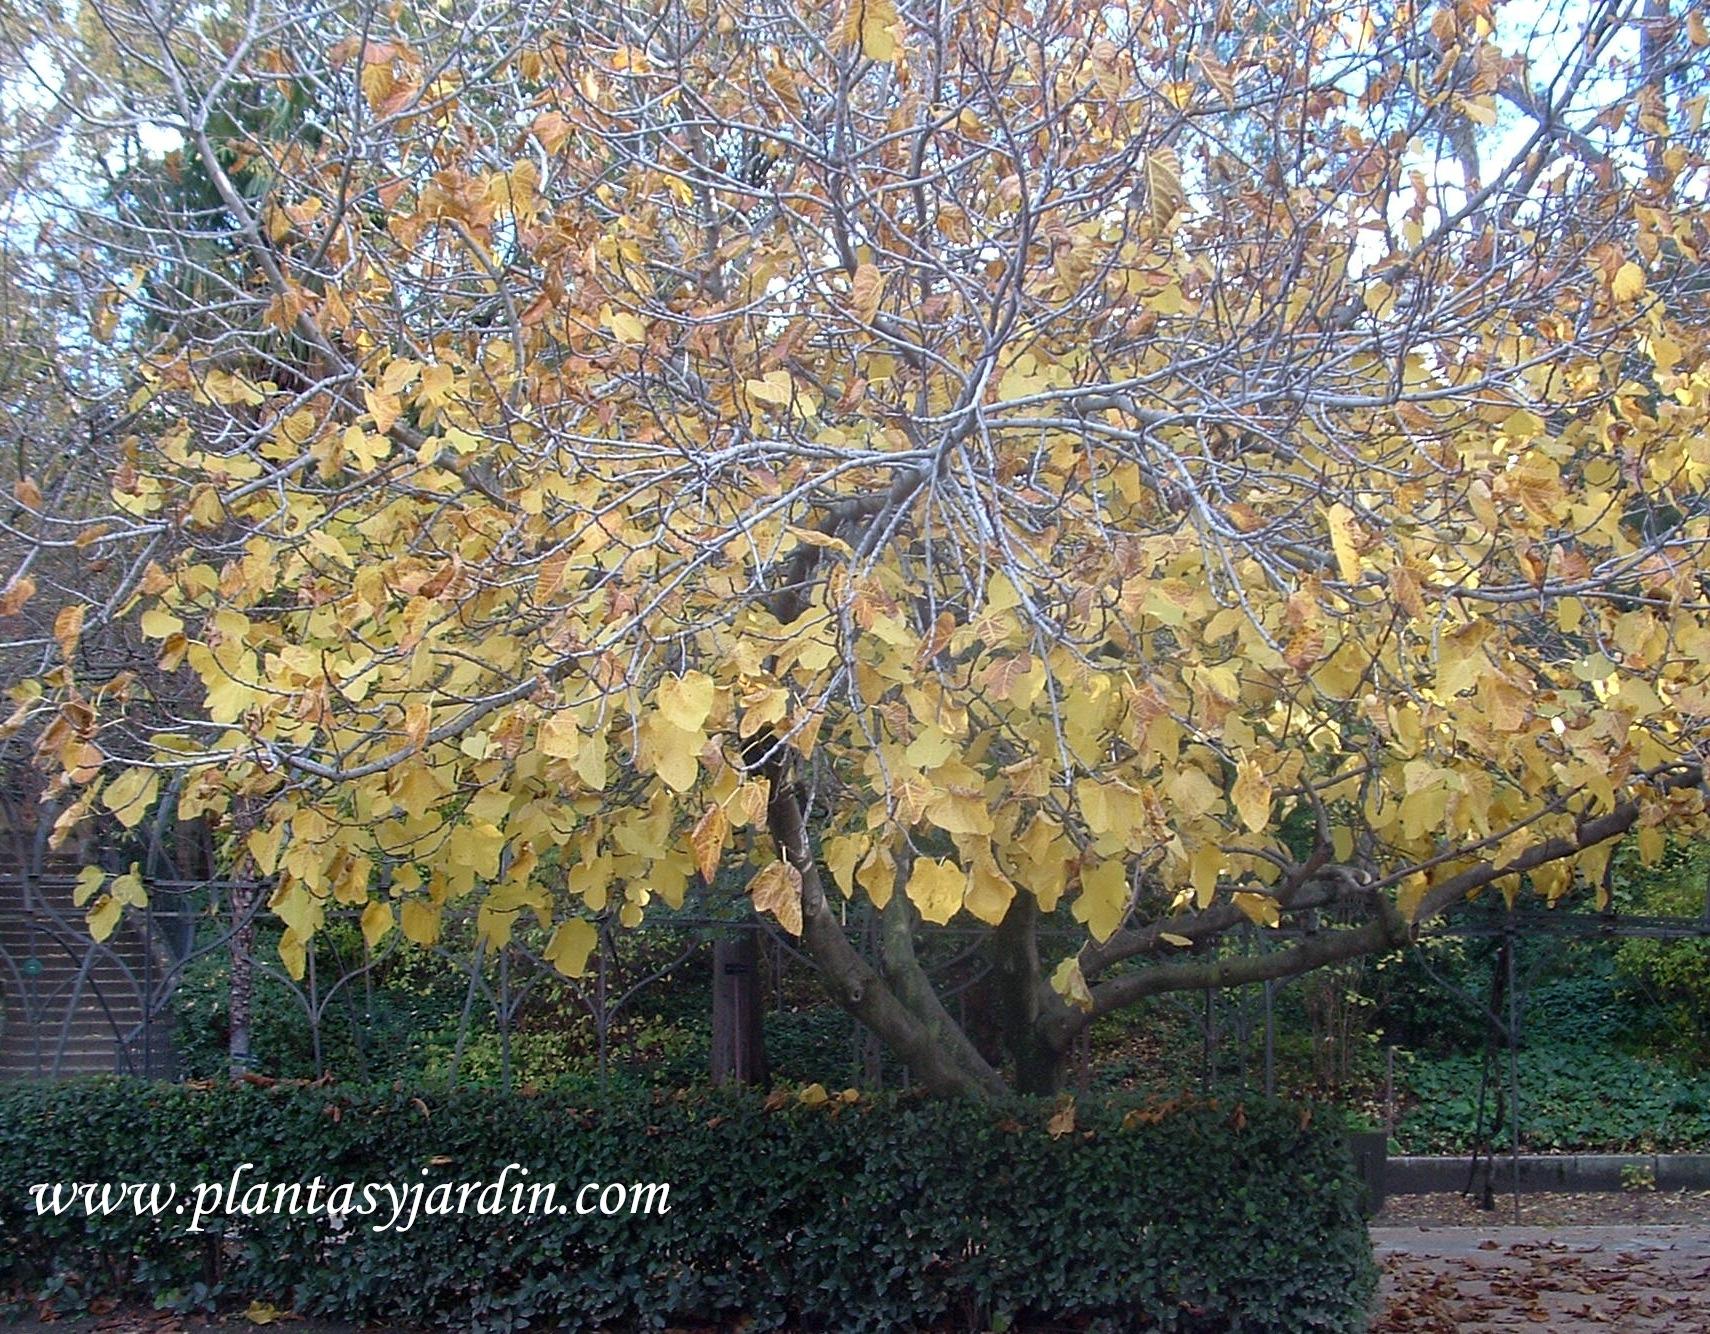 Ficus carica-Higuera, en otoño.